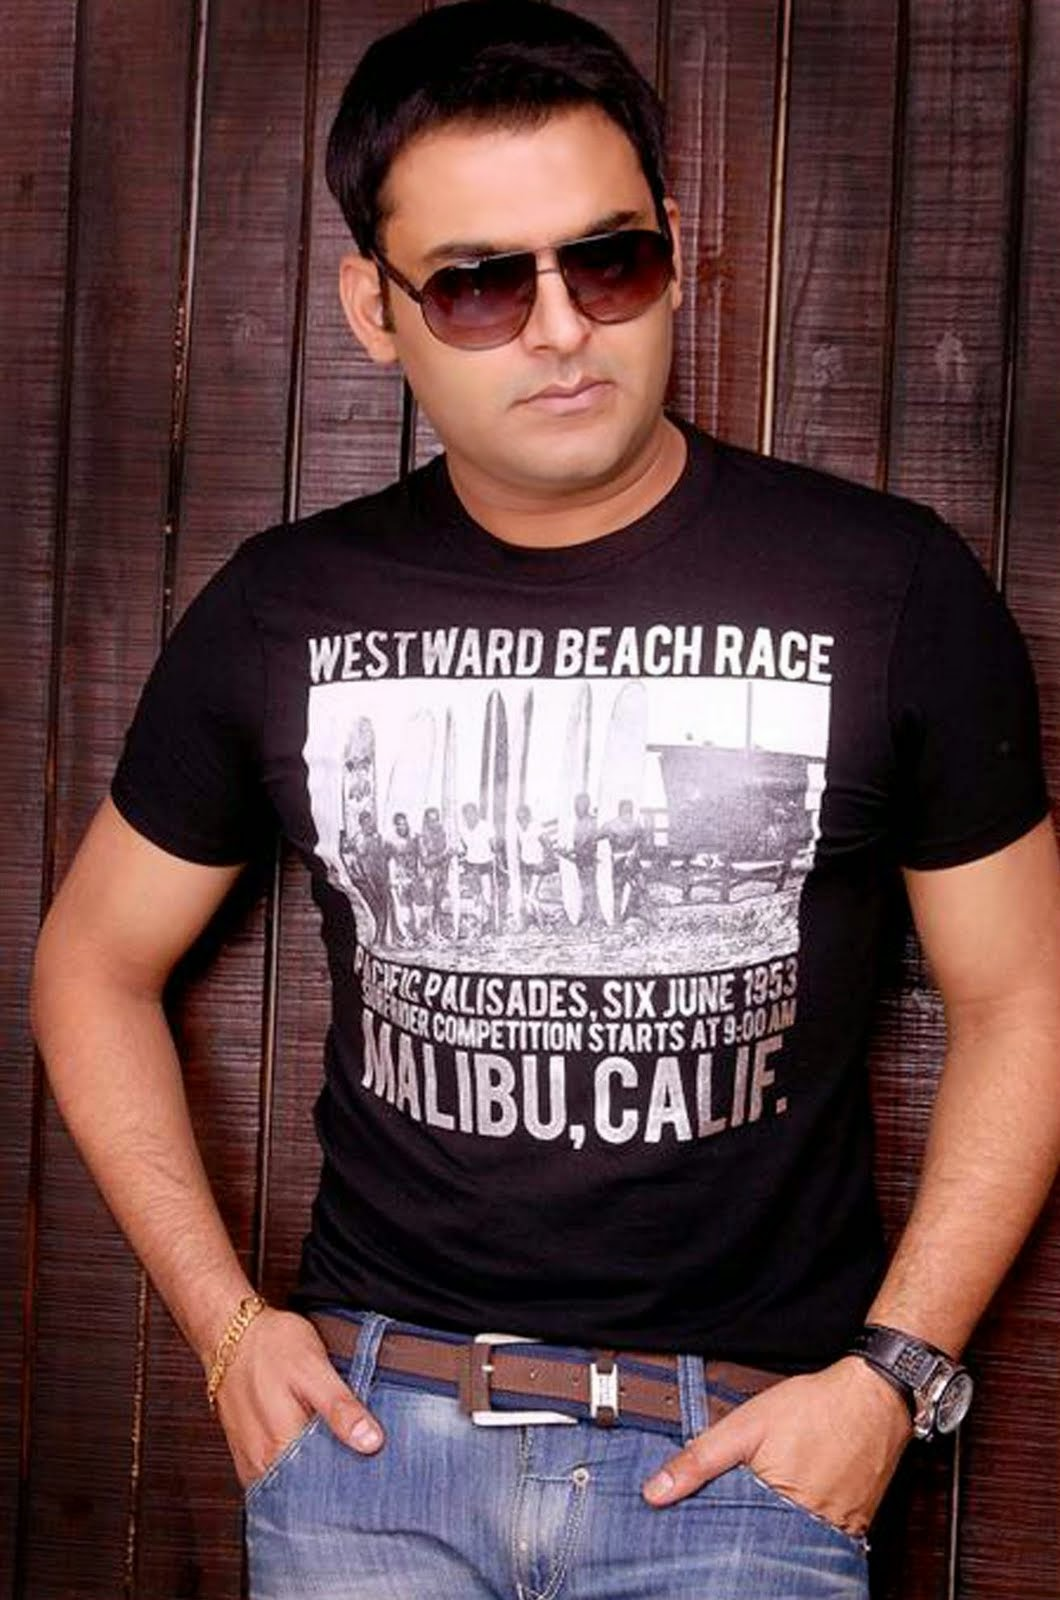 Kapil Sharma, Manish Paul, Jhalak Dikhhla Jaa, Comedy Nights with Kapil, Bank Chor, Bharti Singh, Gangs of Hassepur, TELEBUZZ,